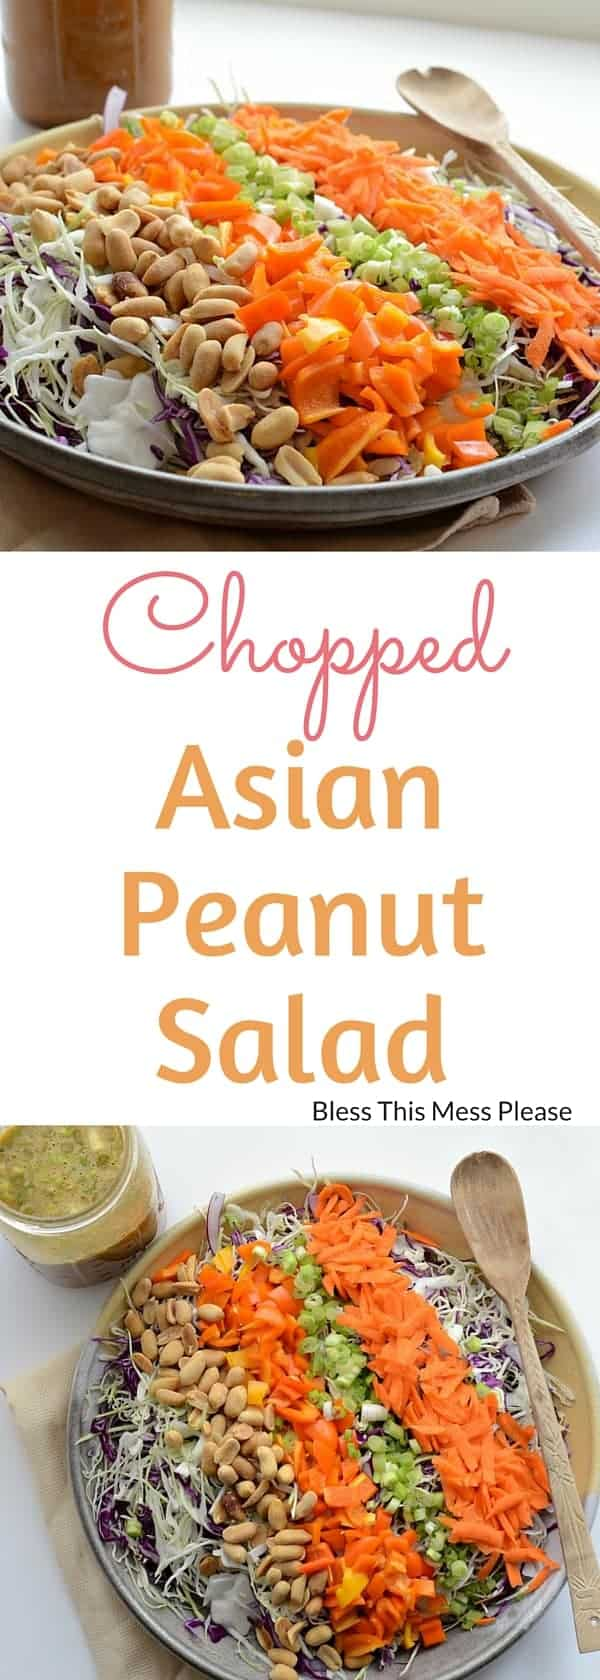 Chopped Asian Peanut Salad